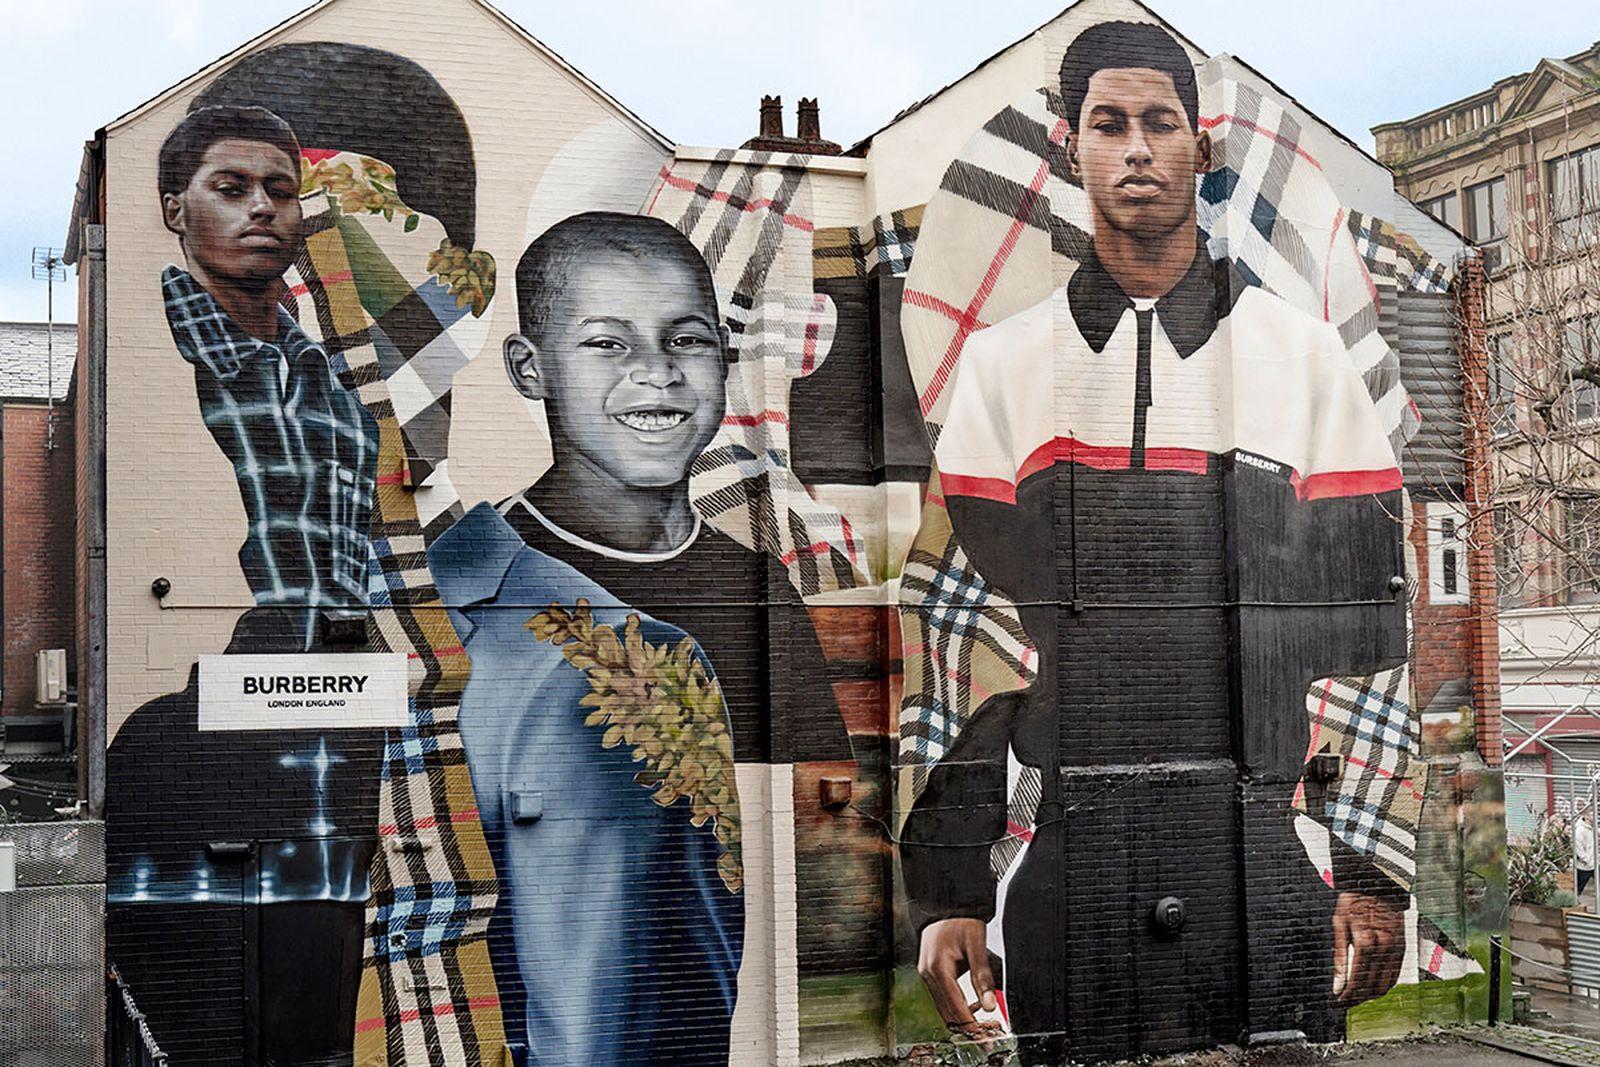 burberry-marcus-rashford-mural-03